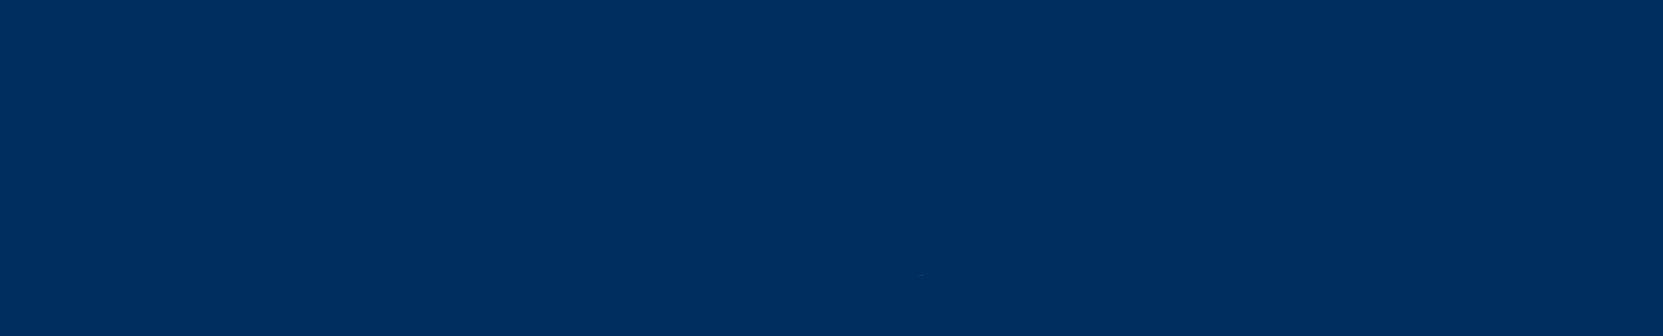 Franja azul.jpg